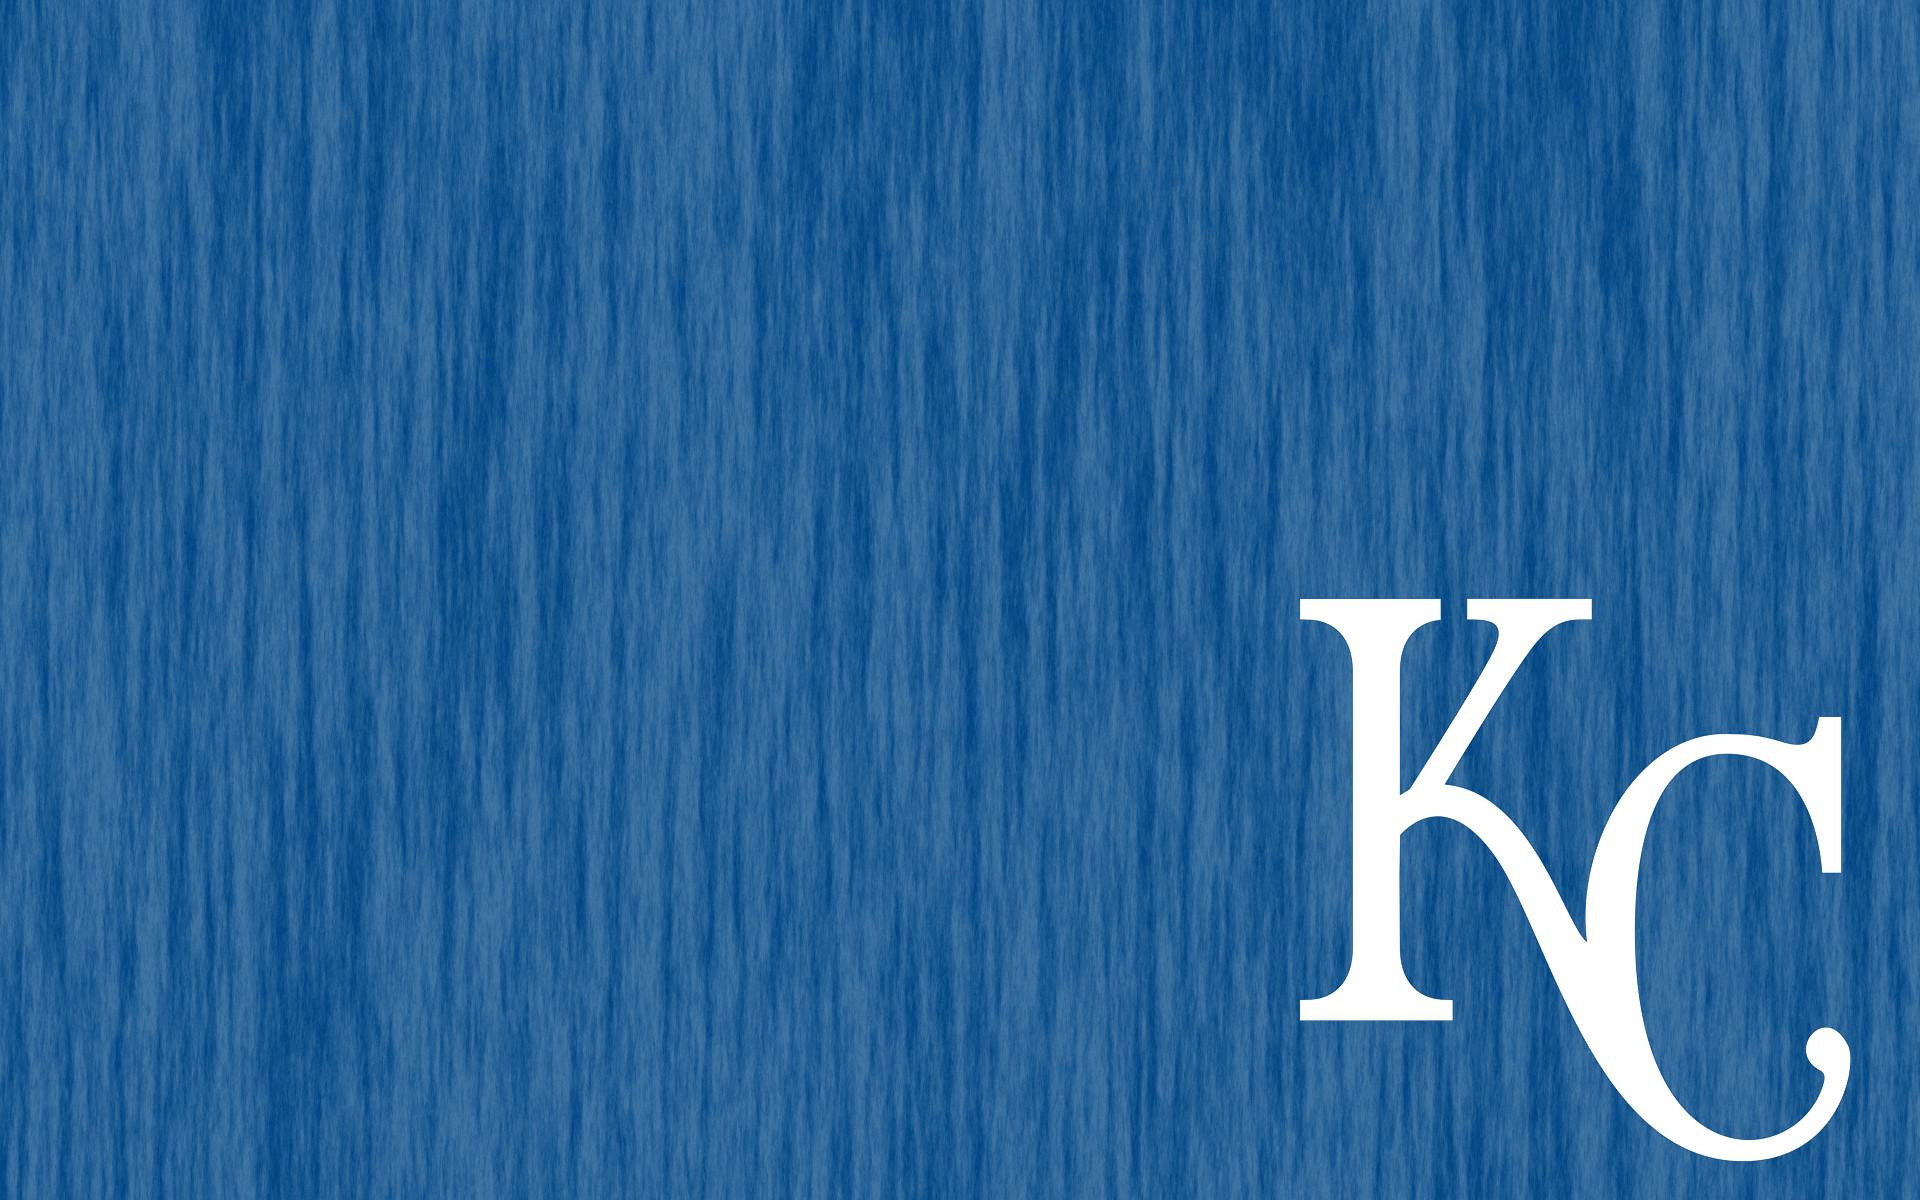 Kc Royals Images